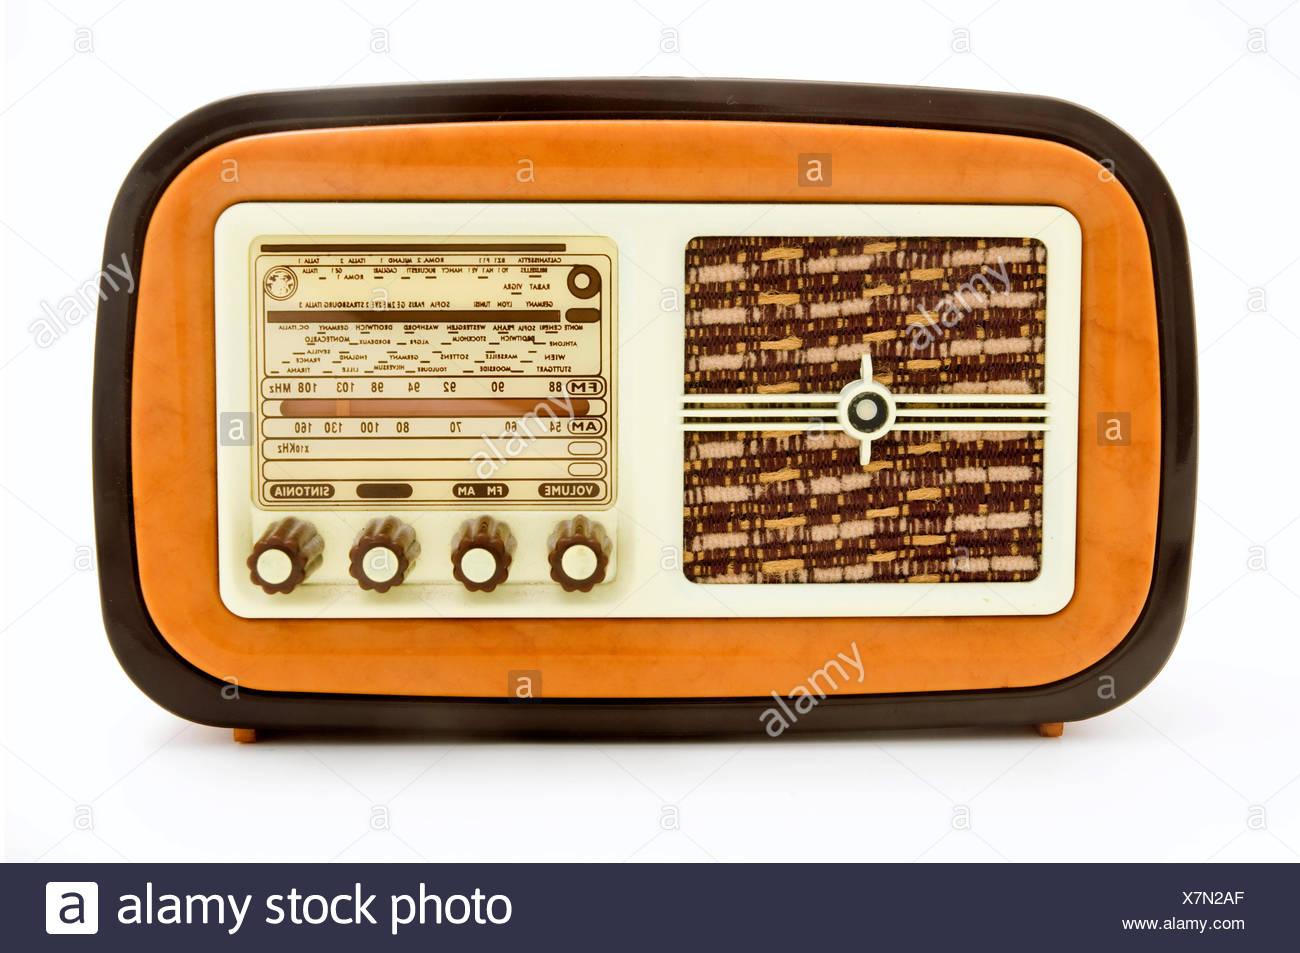 vintage radio old addressee receiver close macro close-up macro admission close - Stock Image